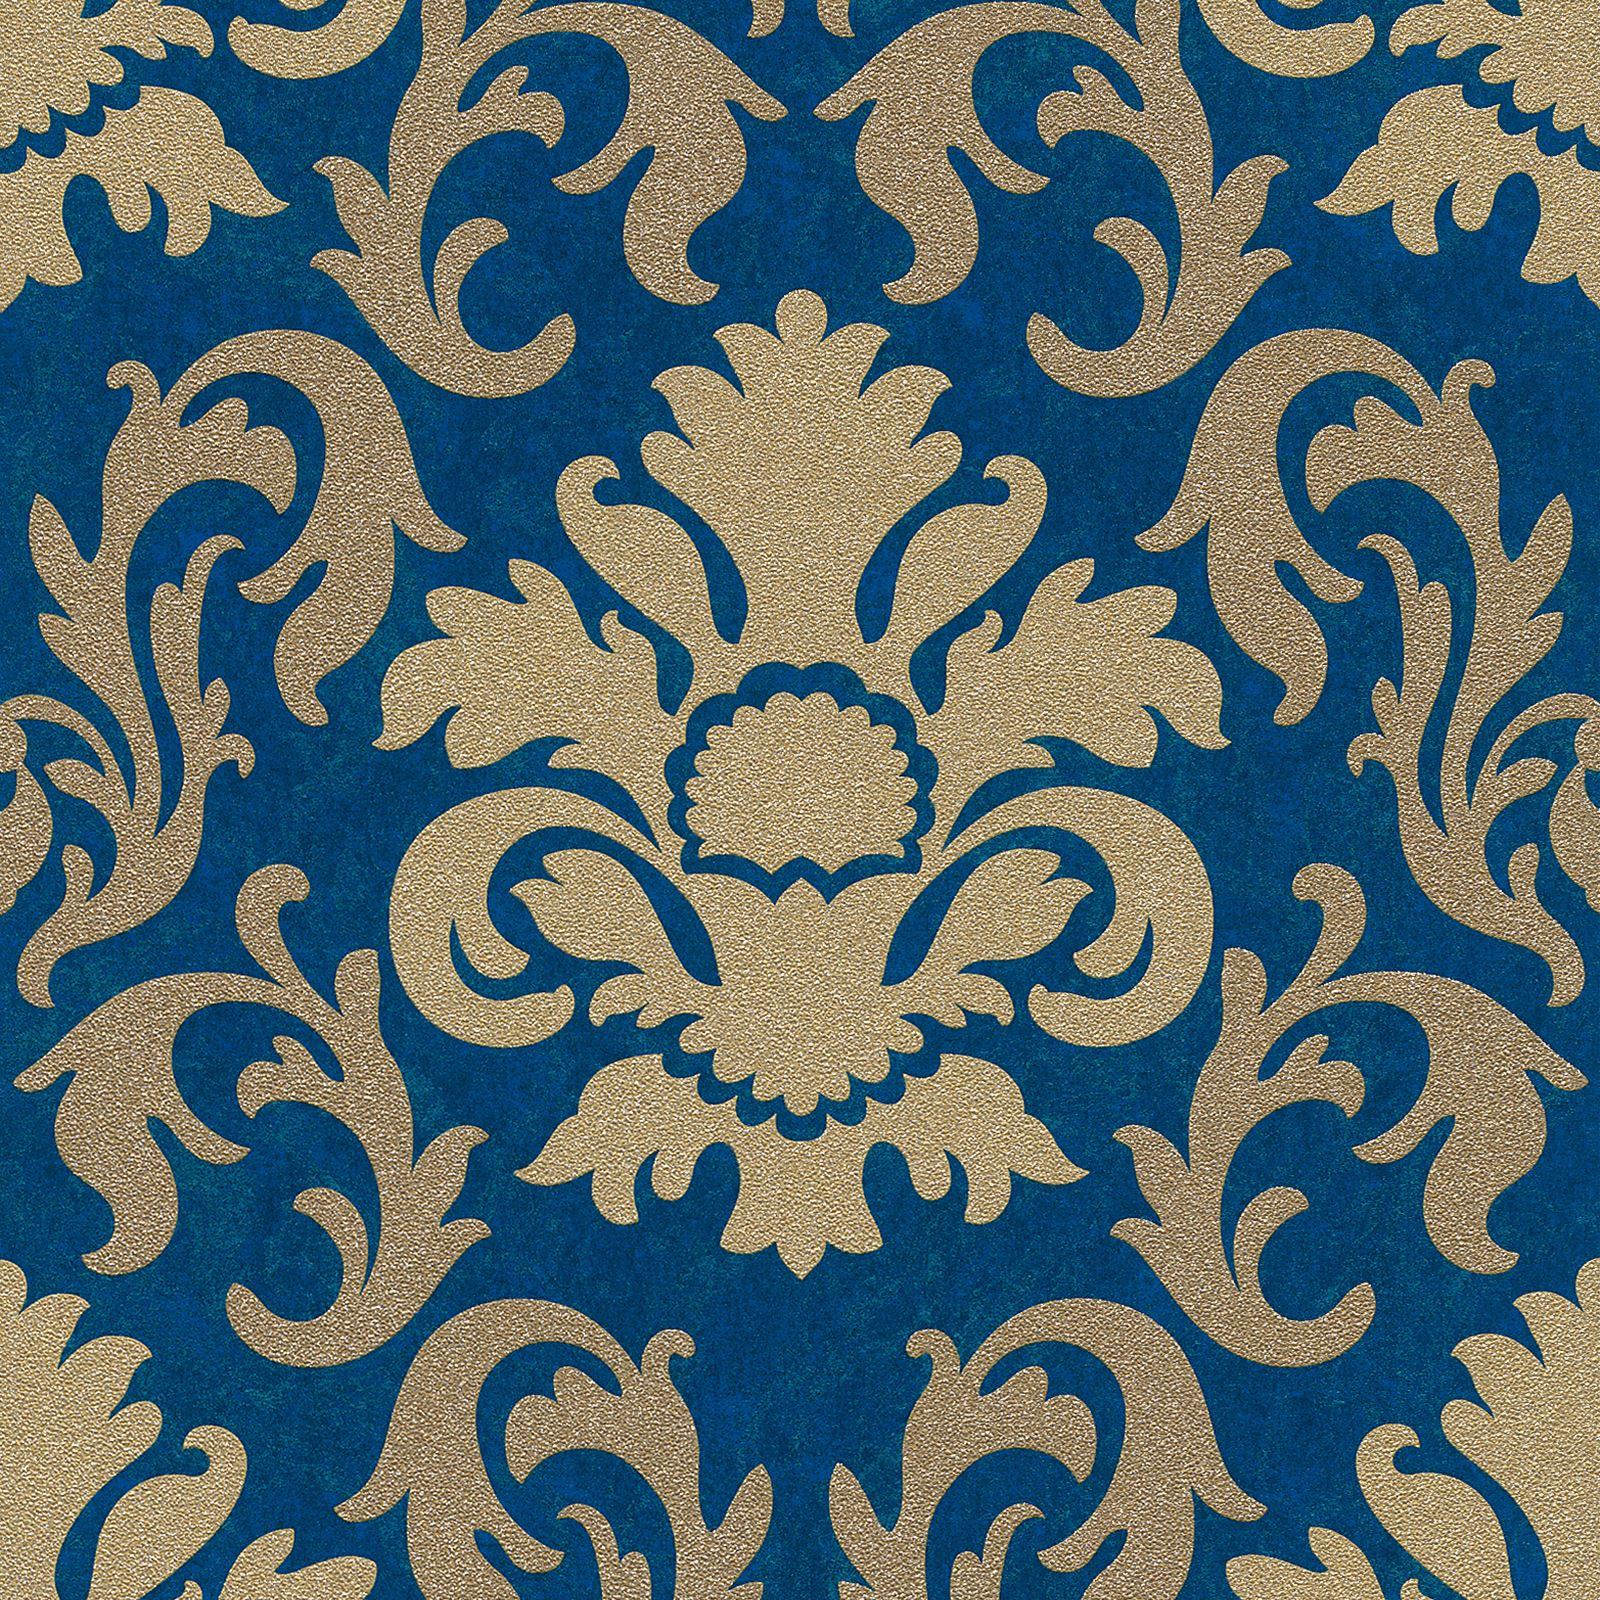 p&s carat blue & gold glitter wallpaper - damask, stripe